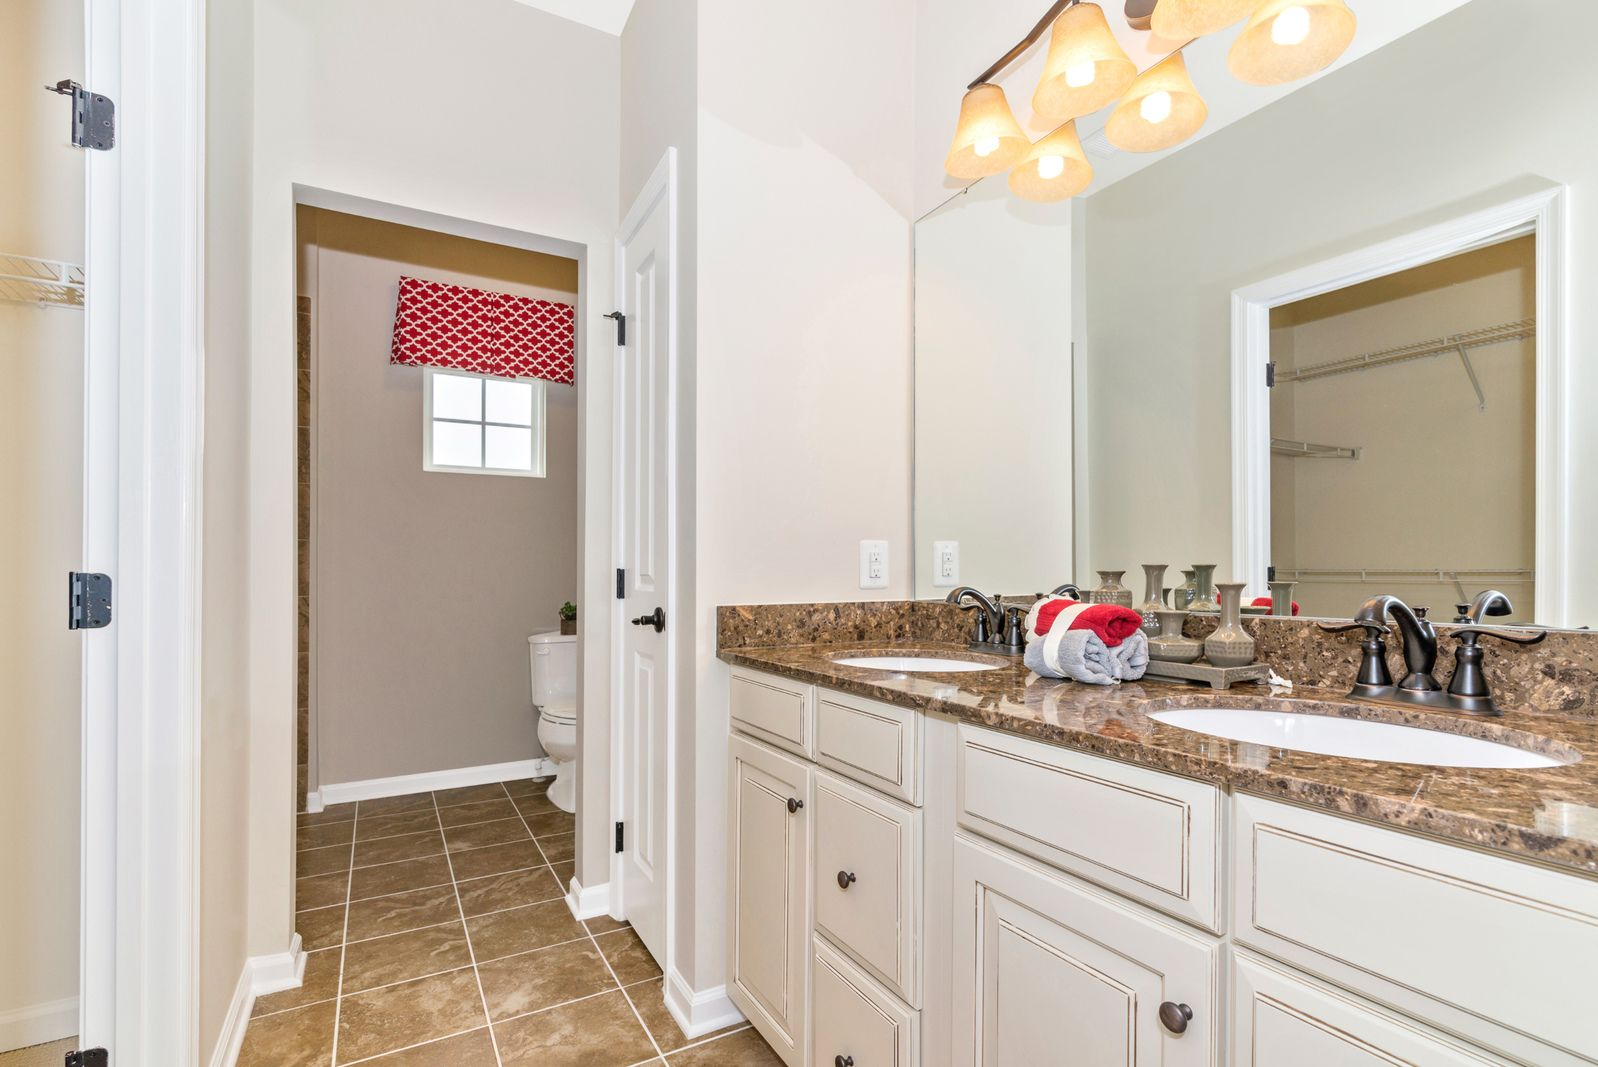 Bathroom featured in the Ernest Hemingway By Ryan Homes in Norfolk-Newport News, VA